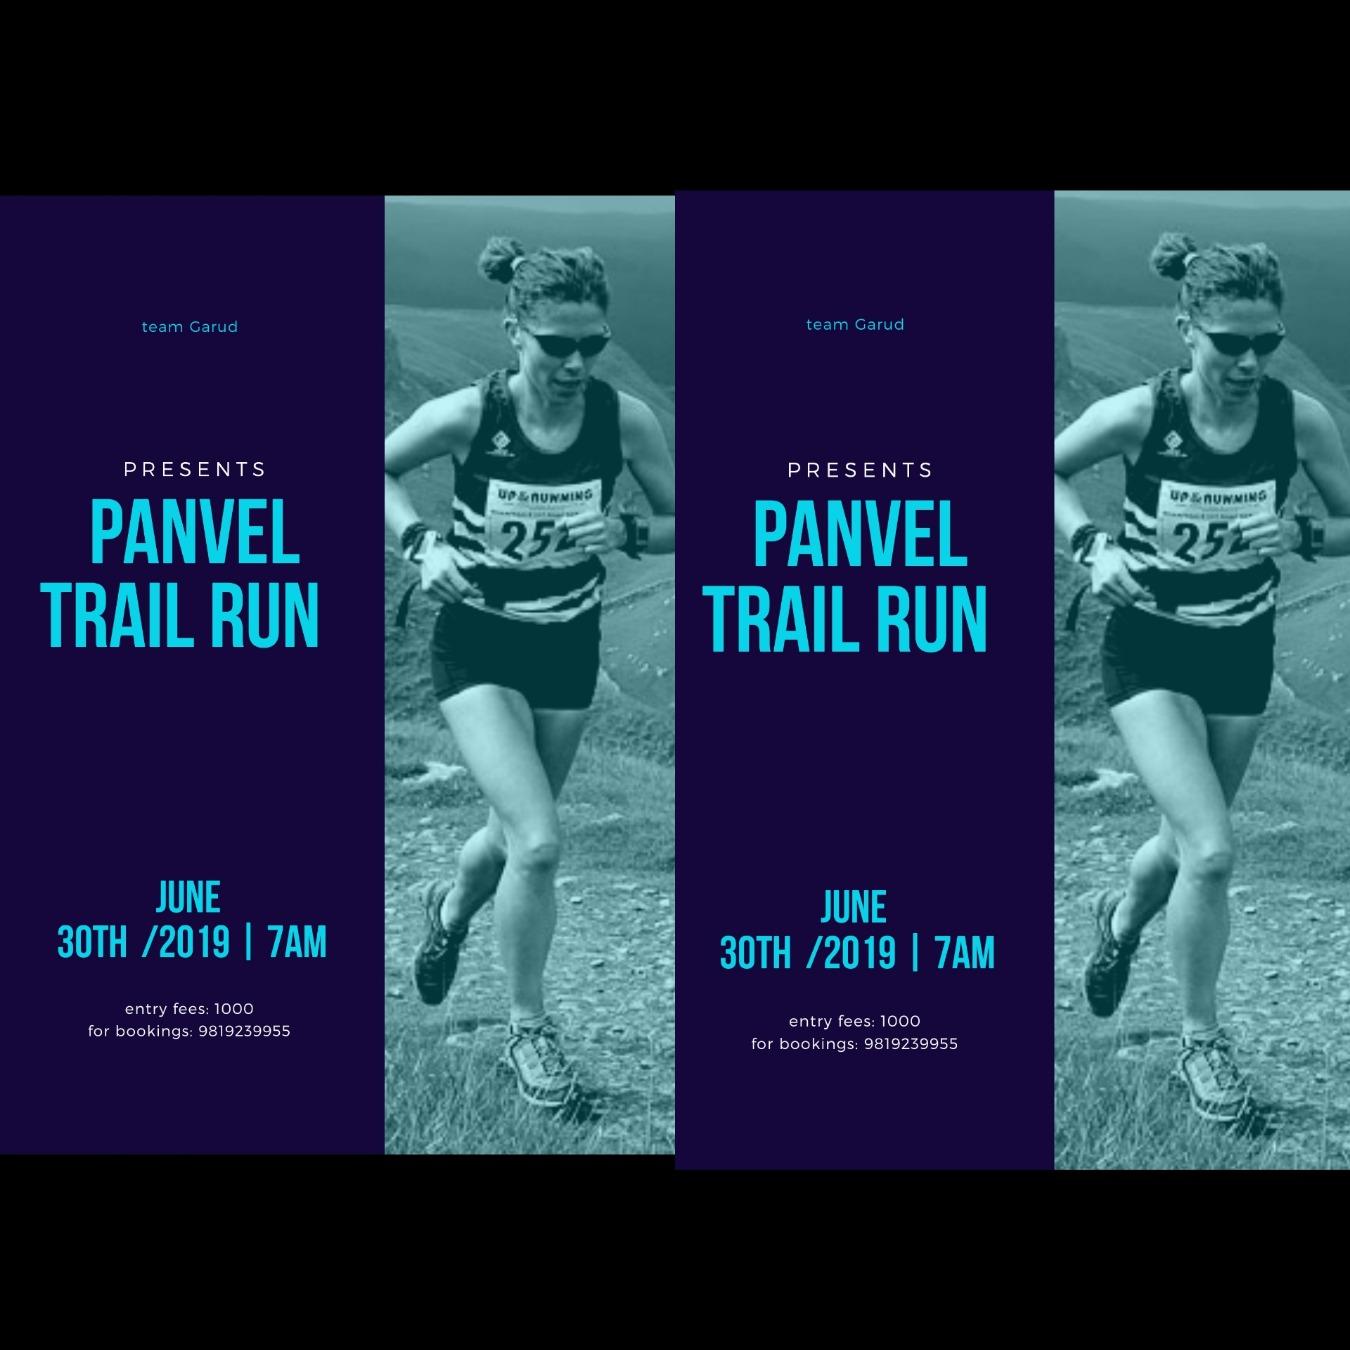 326b6622954 Panvel Trail Run 2019 Tickets by Team Garud, 30 Jun, 2019, Navi Mumbai Event